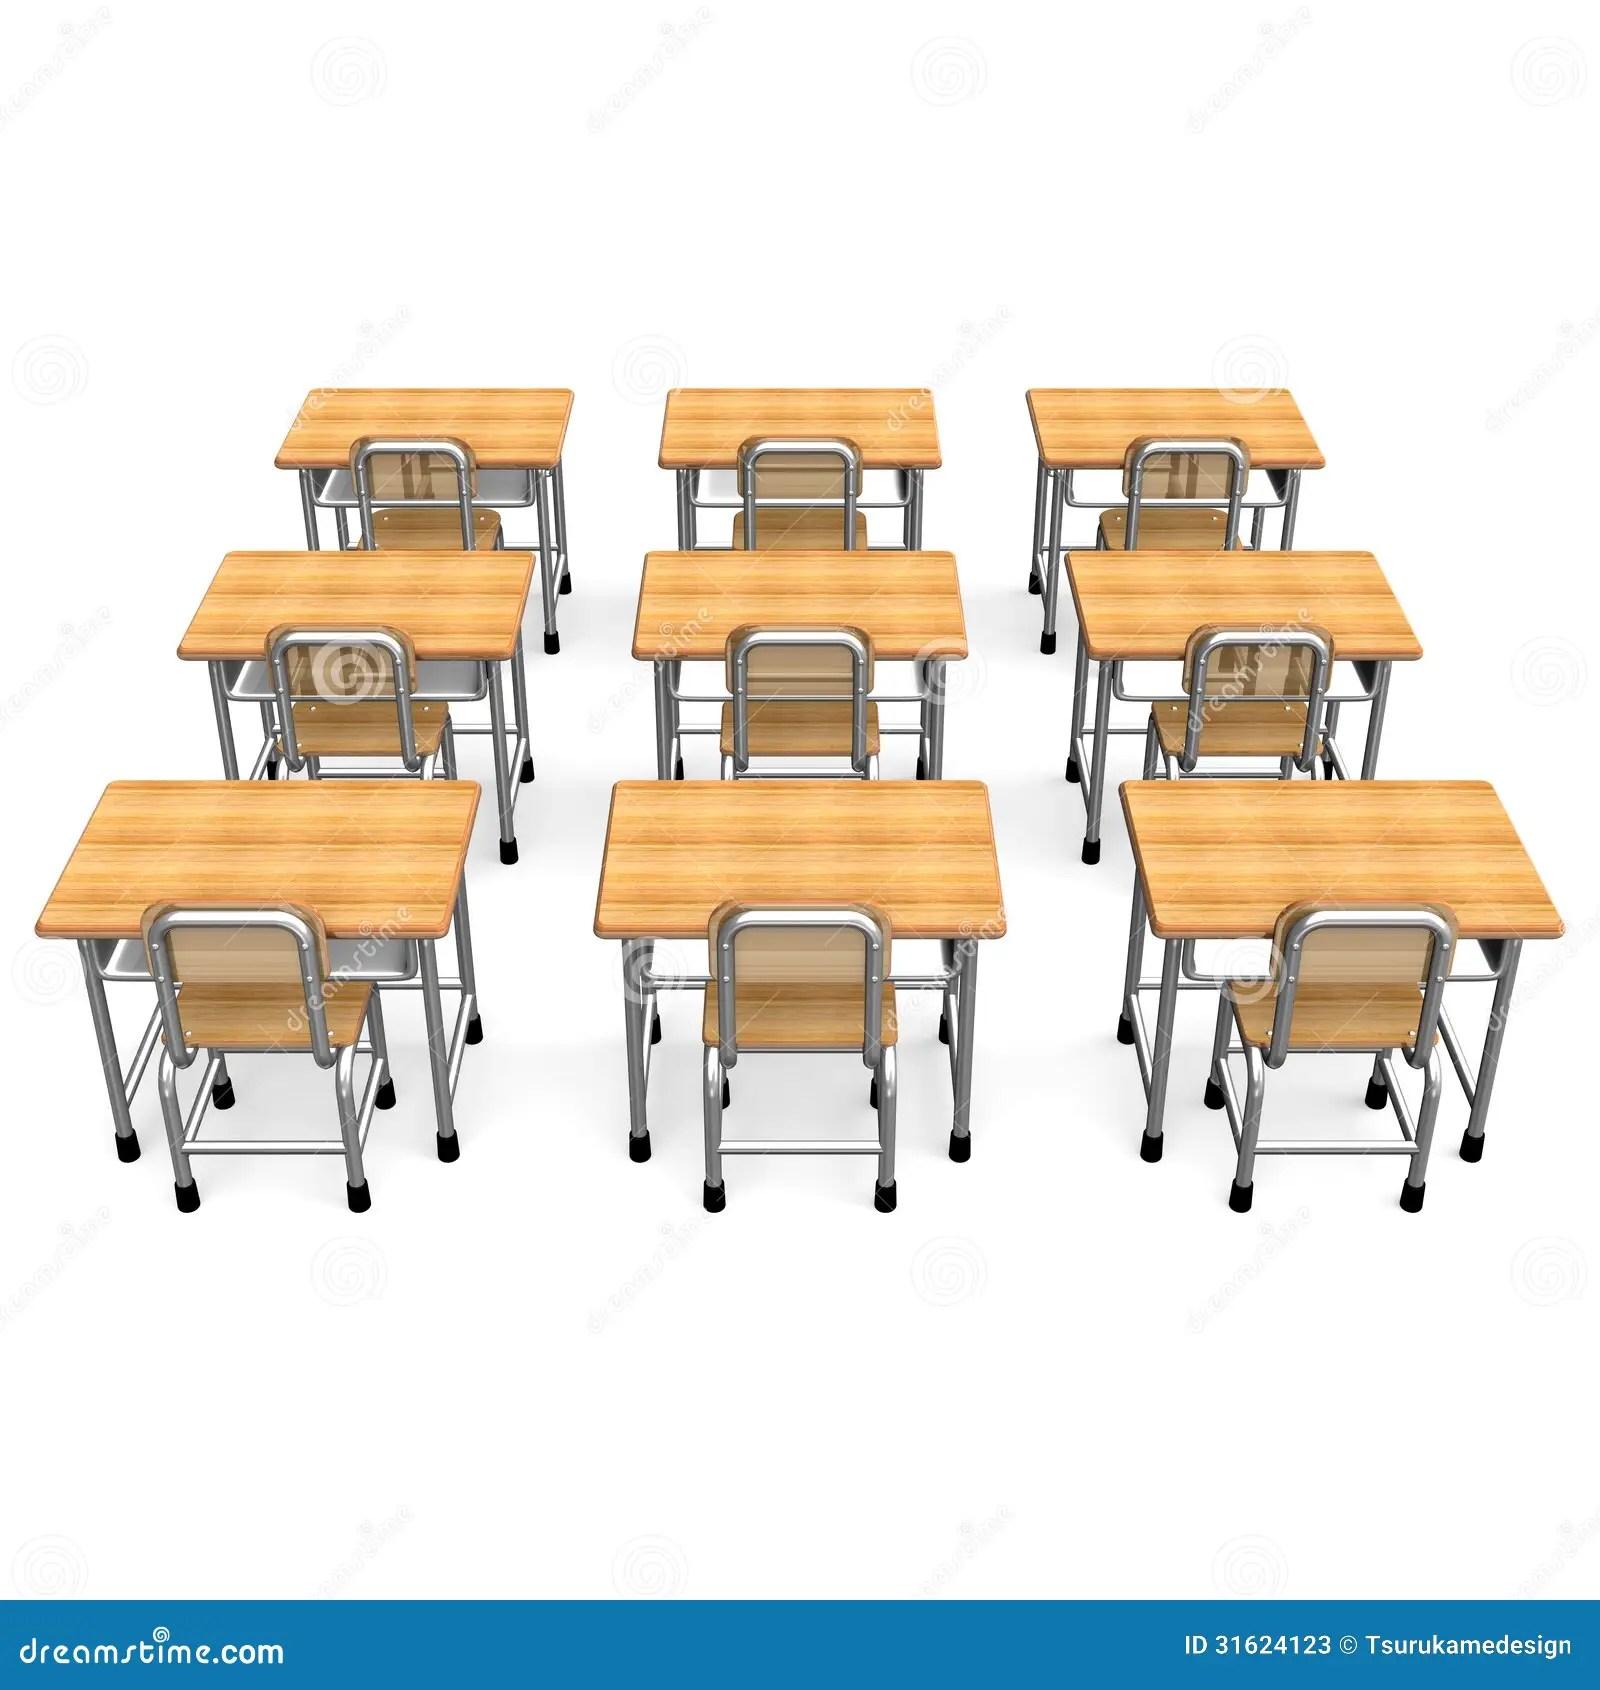 Back View School Desk Chair Combo